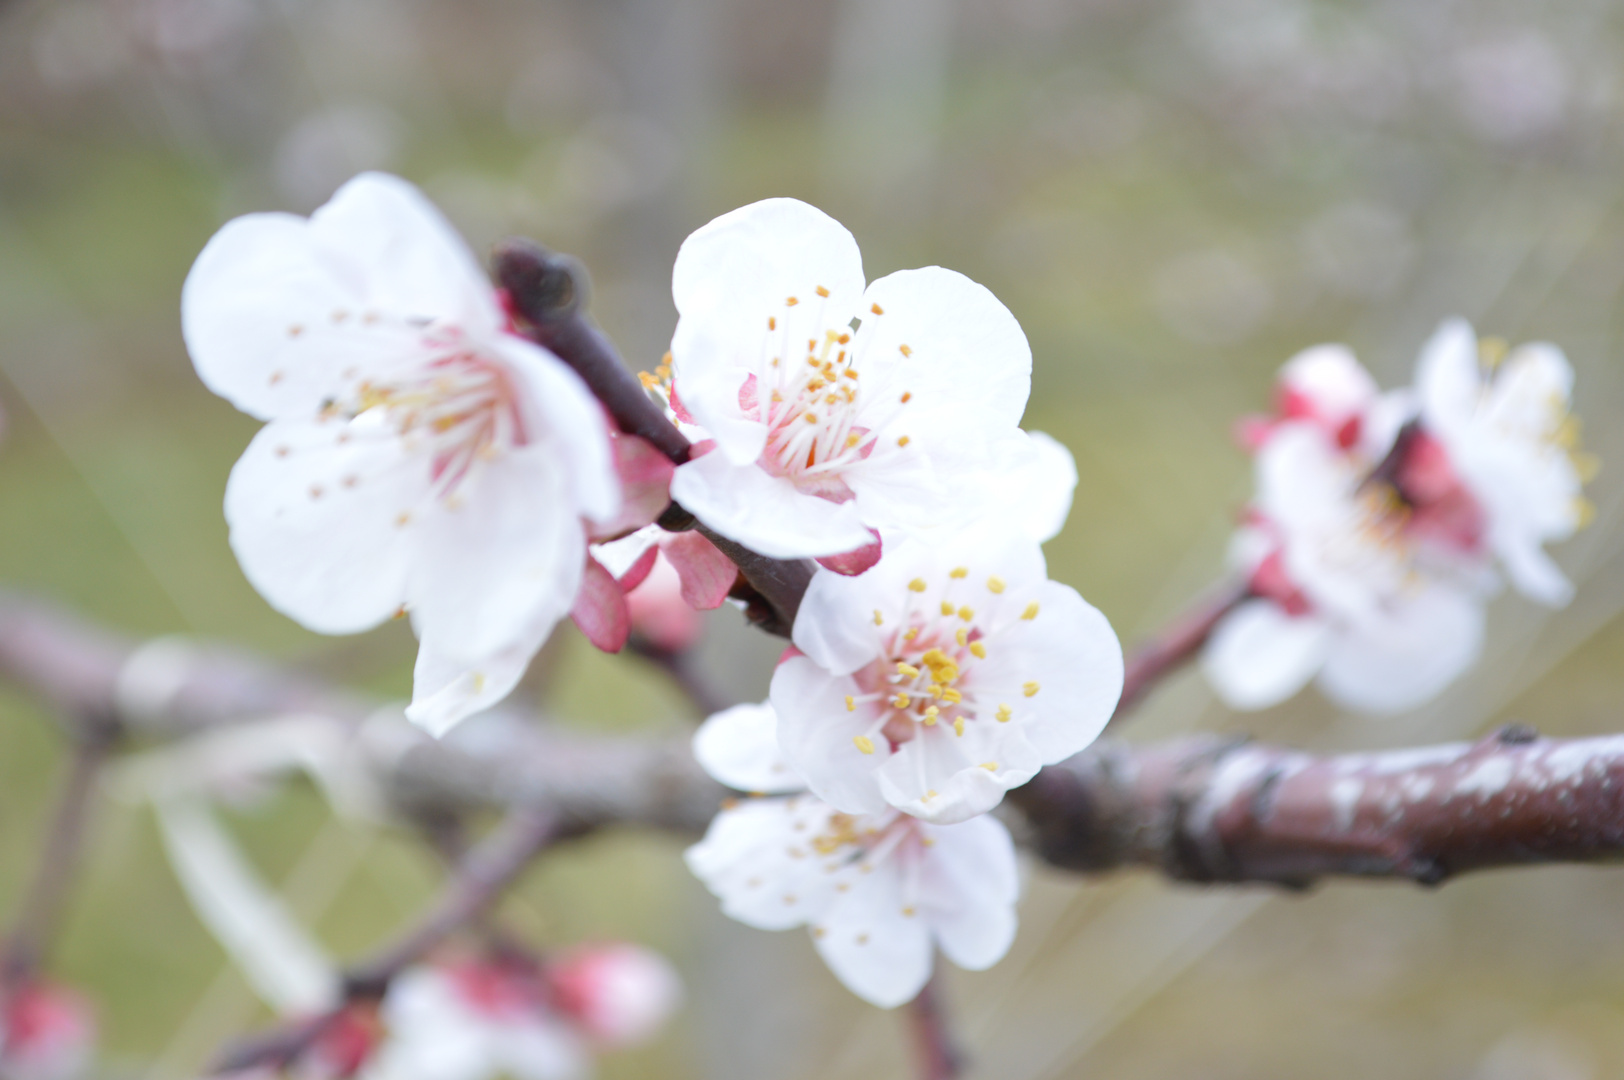 Der Frühlingsanfang